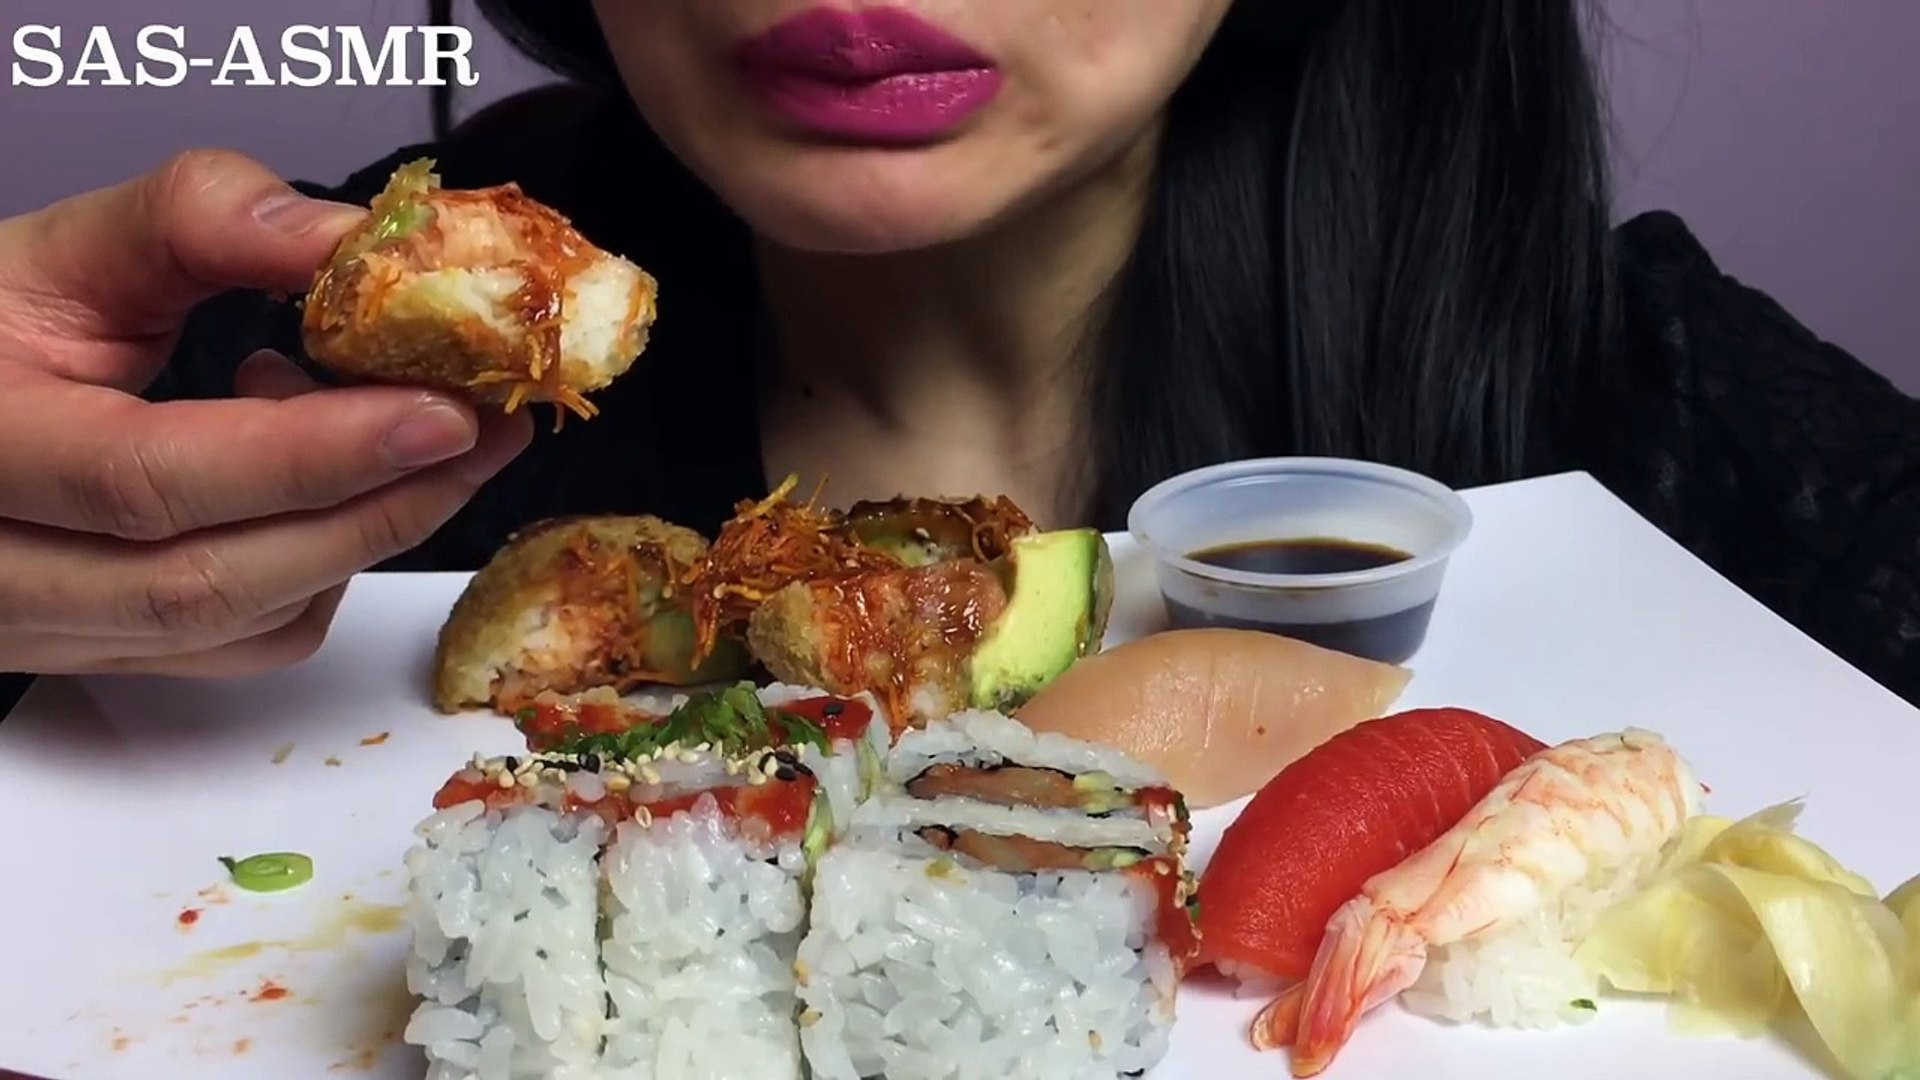 Asmr Sushi Spicy Tuna Sushi Monkey Brain Nigiri Eating Sounds Sas Asmr Video Dailymotion Sas asmr скачать с видео в mp4, flv вы можете скачать m4a аудио формат. asmr sushi spicy tuna sushi monkey brain nigiri eating sounds sas asmr